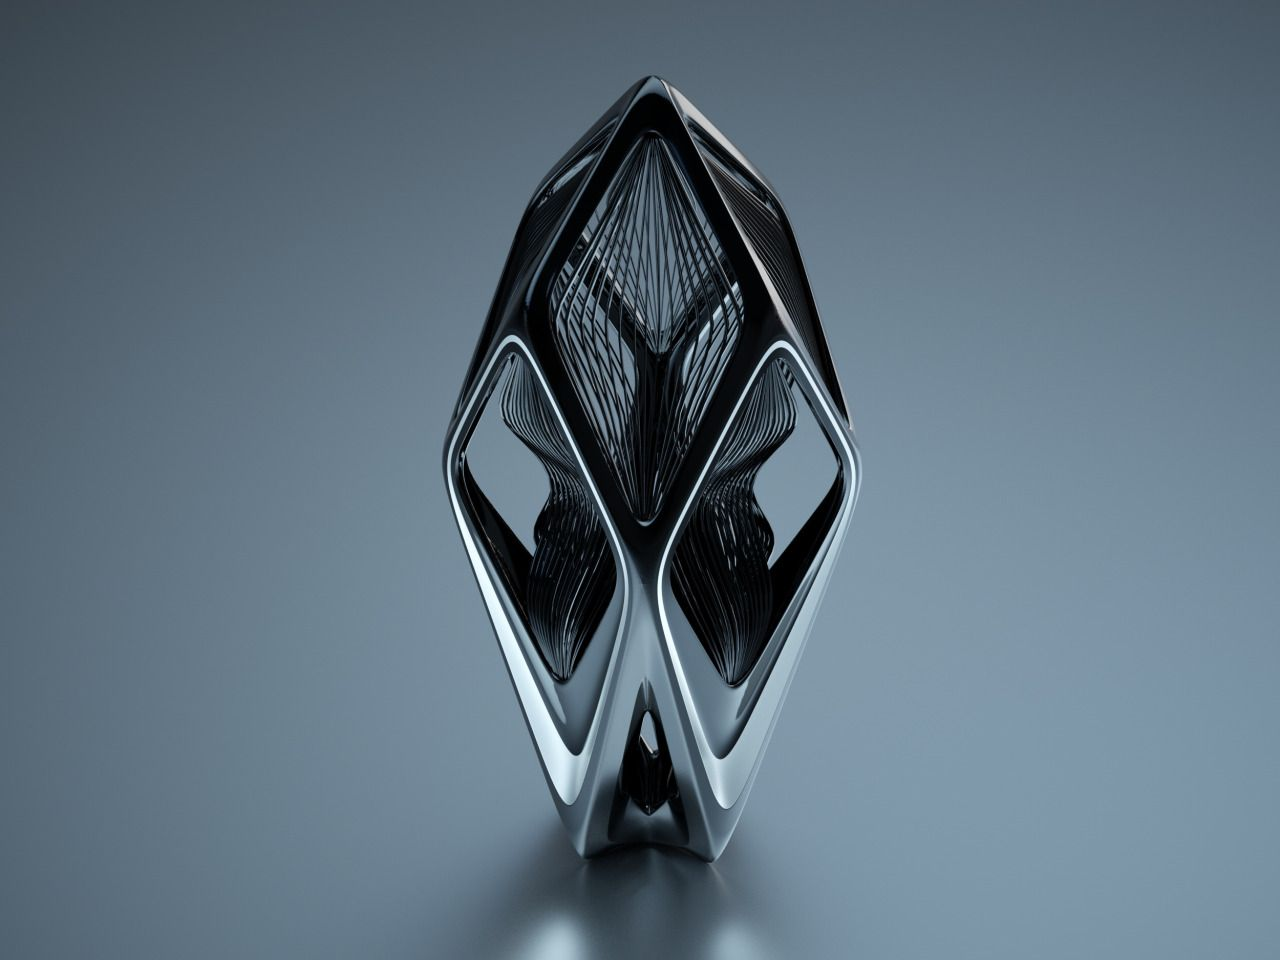 levente gyulai | Bottle design, Trophy design, Futuristic ...